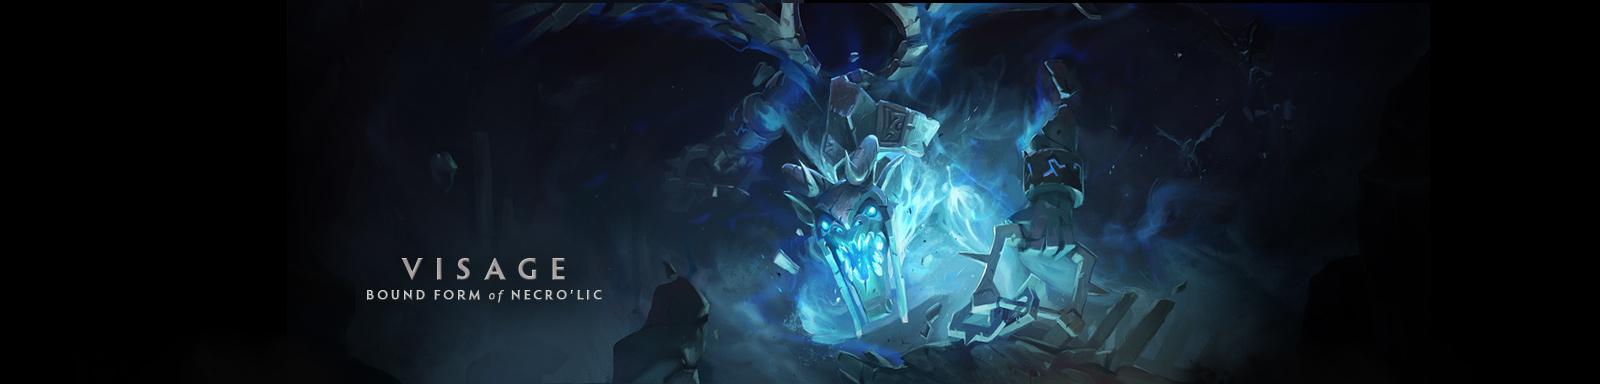 Visage Dota 2 'Bound form' of Necro'...